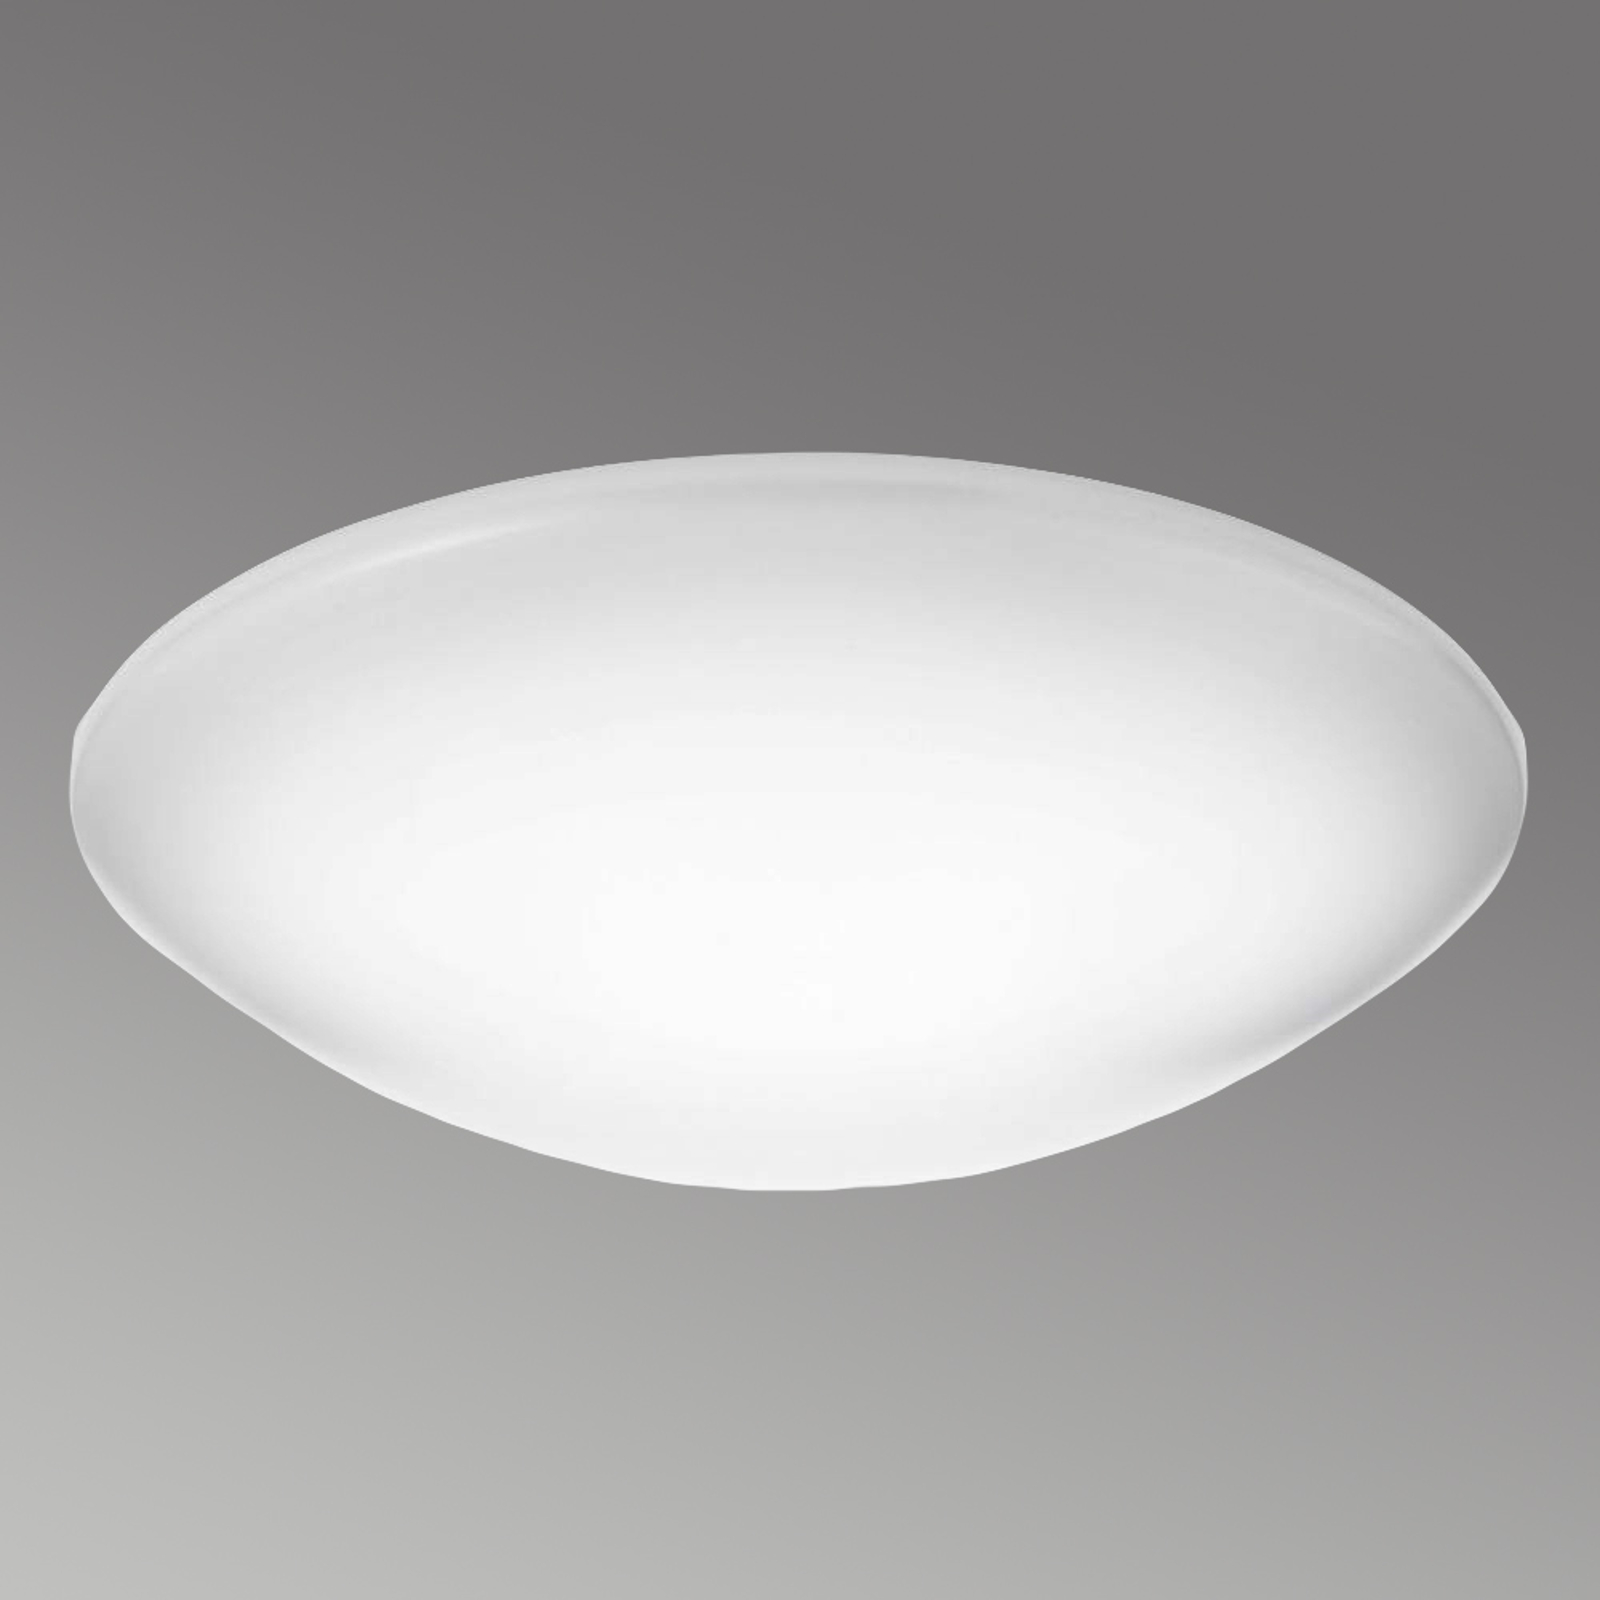 Grote LED plafondlamp Suède uit kunststof